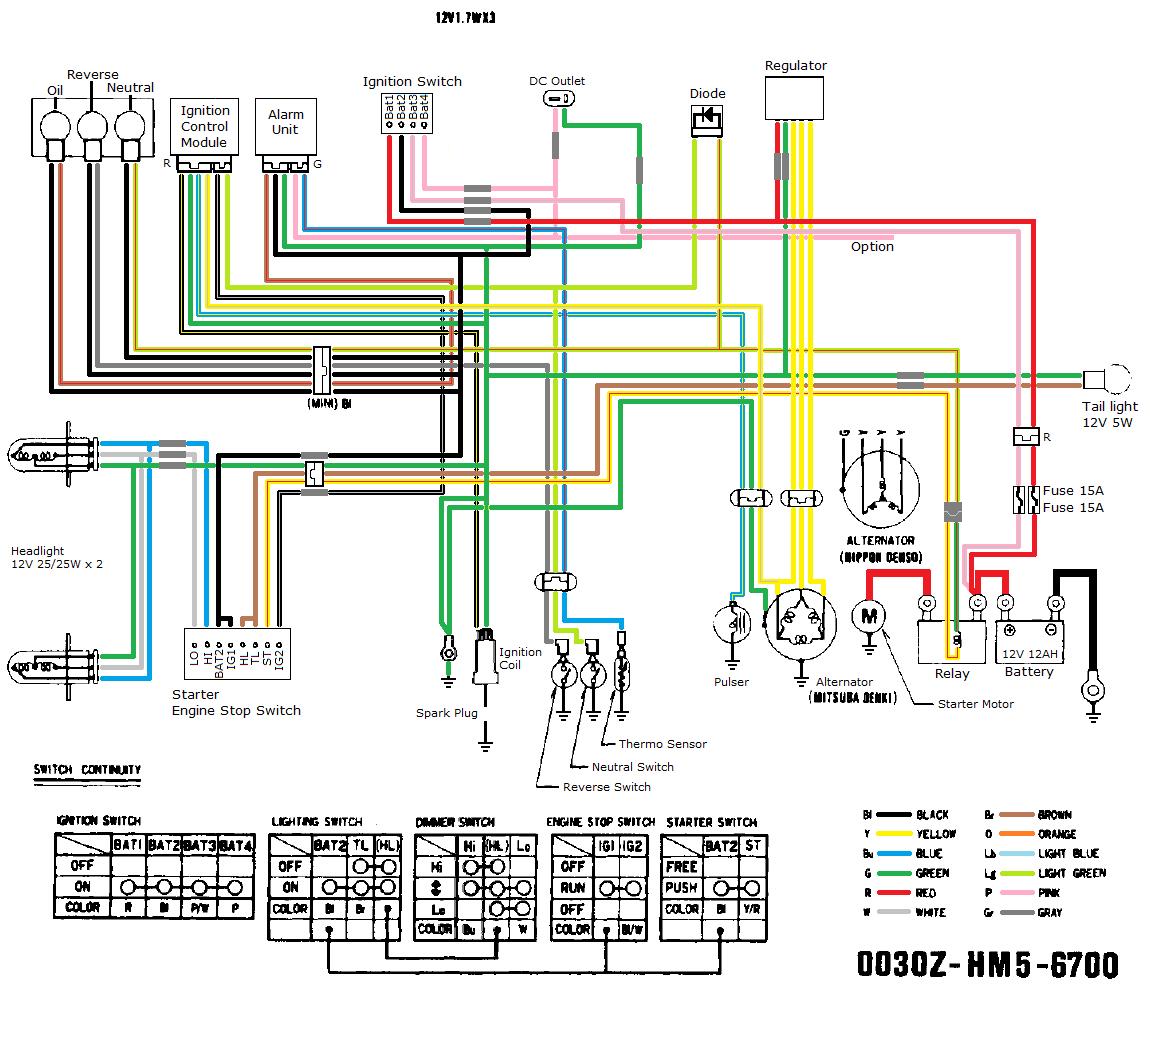 Incredible Sundiro Atv Wiring Diagram Wiring Diagram Wiring Cloud Picalendutblikvittorg